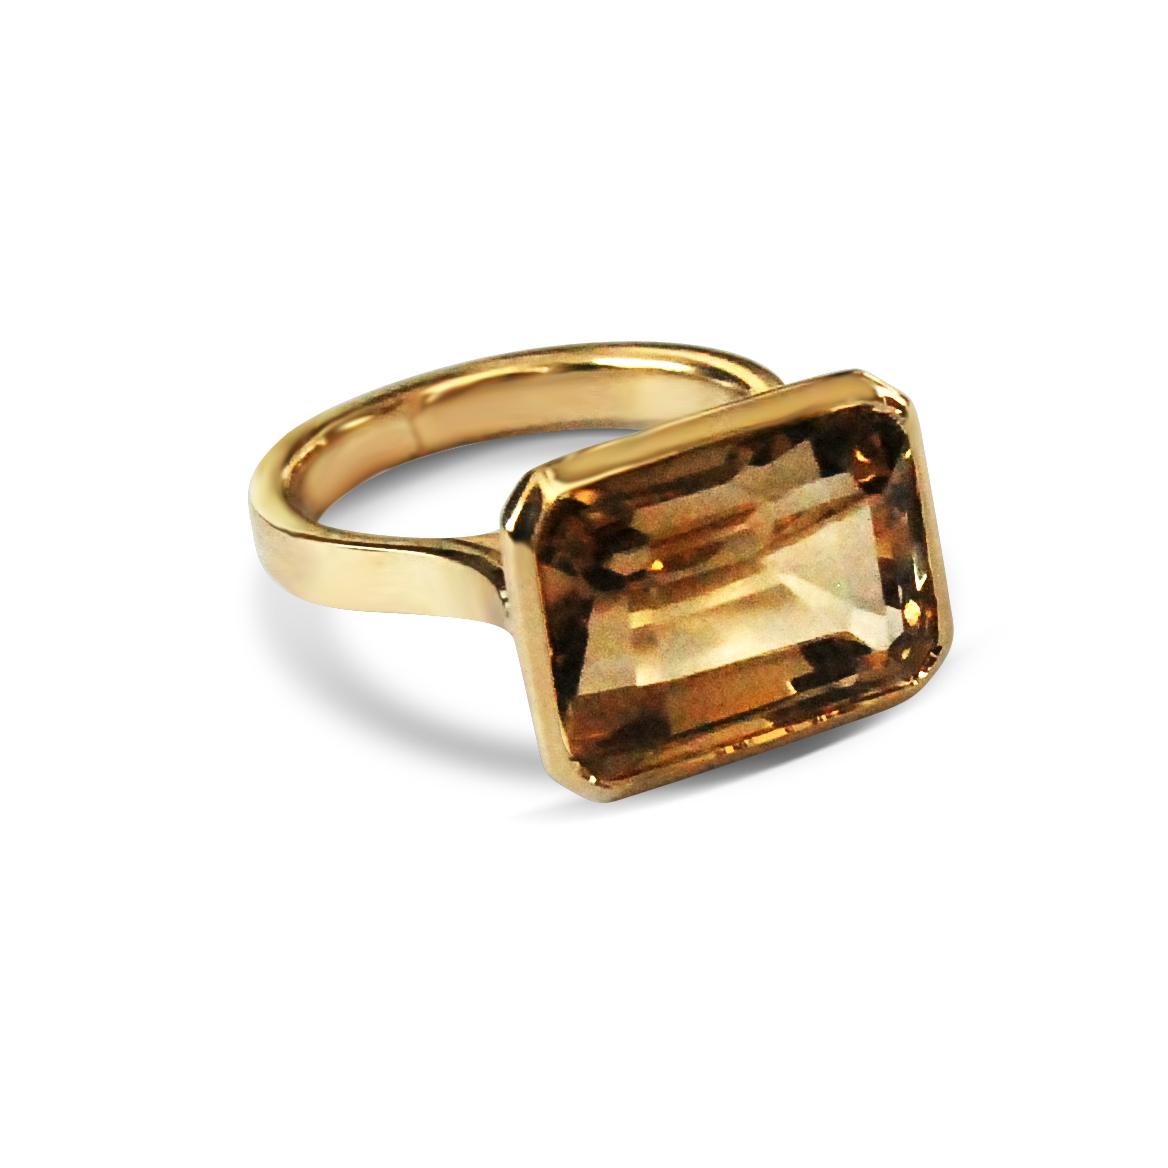 Smoky-quartz-and-yellow-gold-ring.jpg